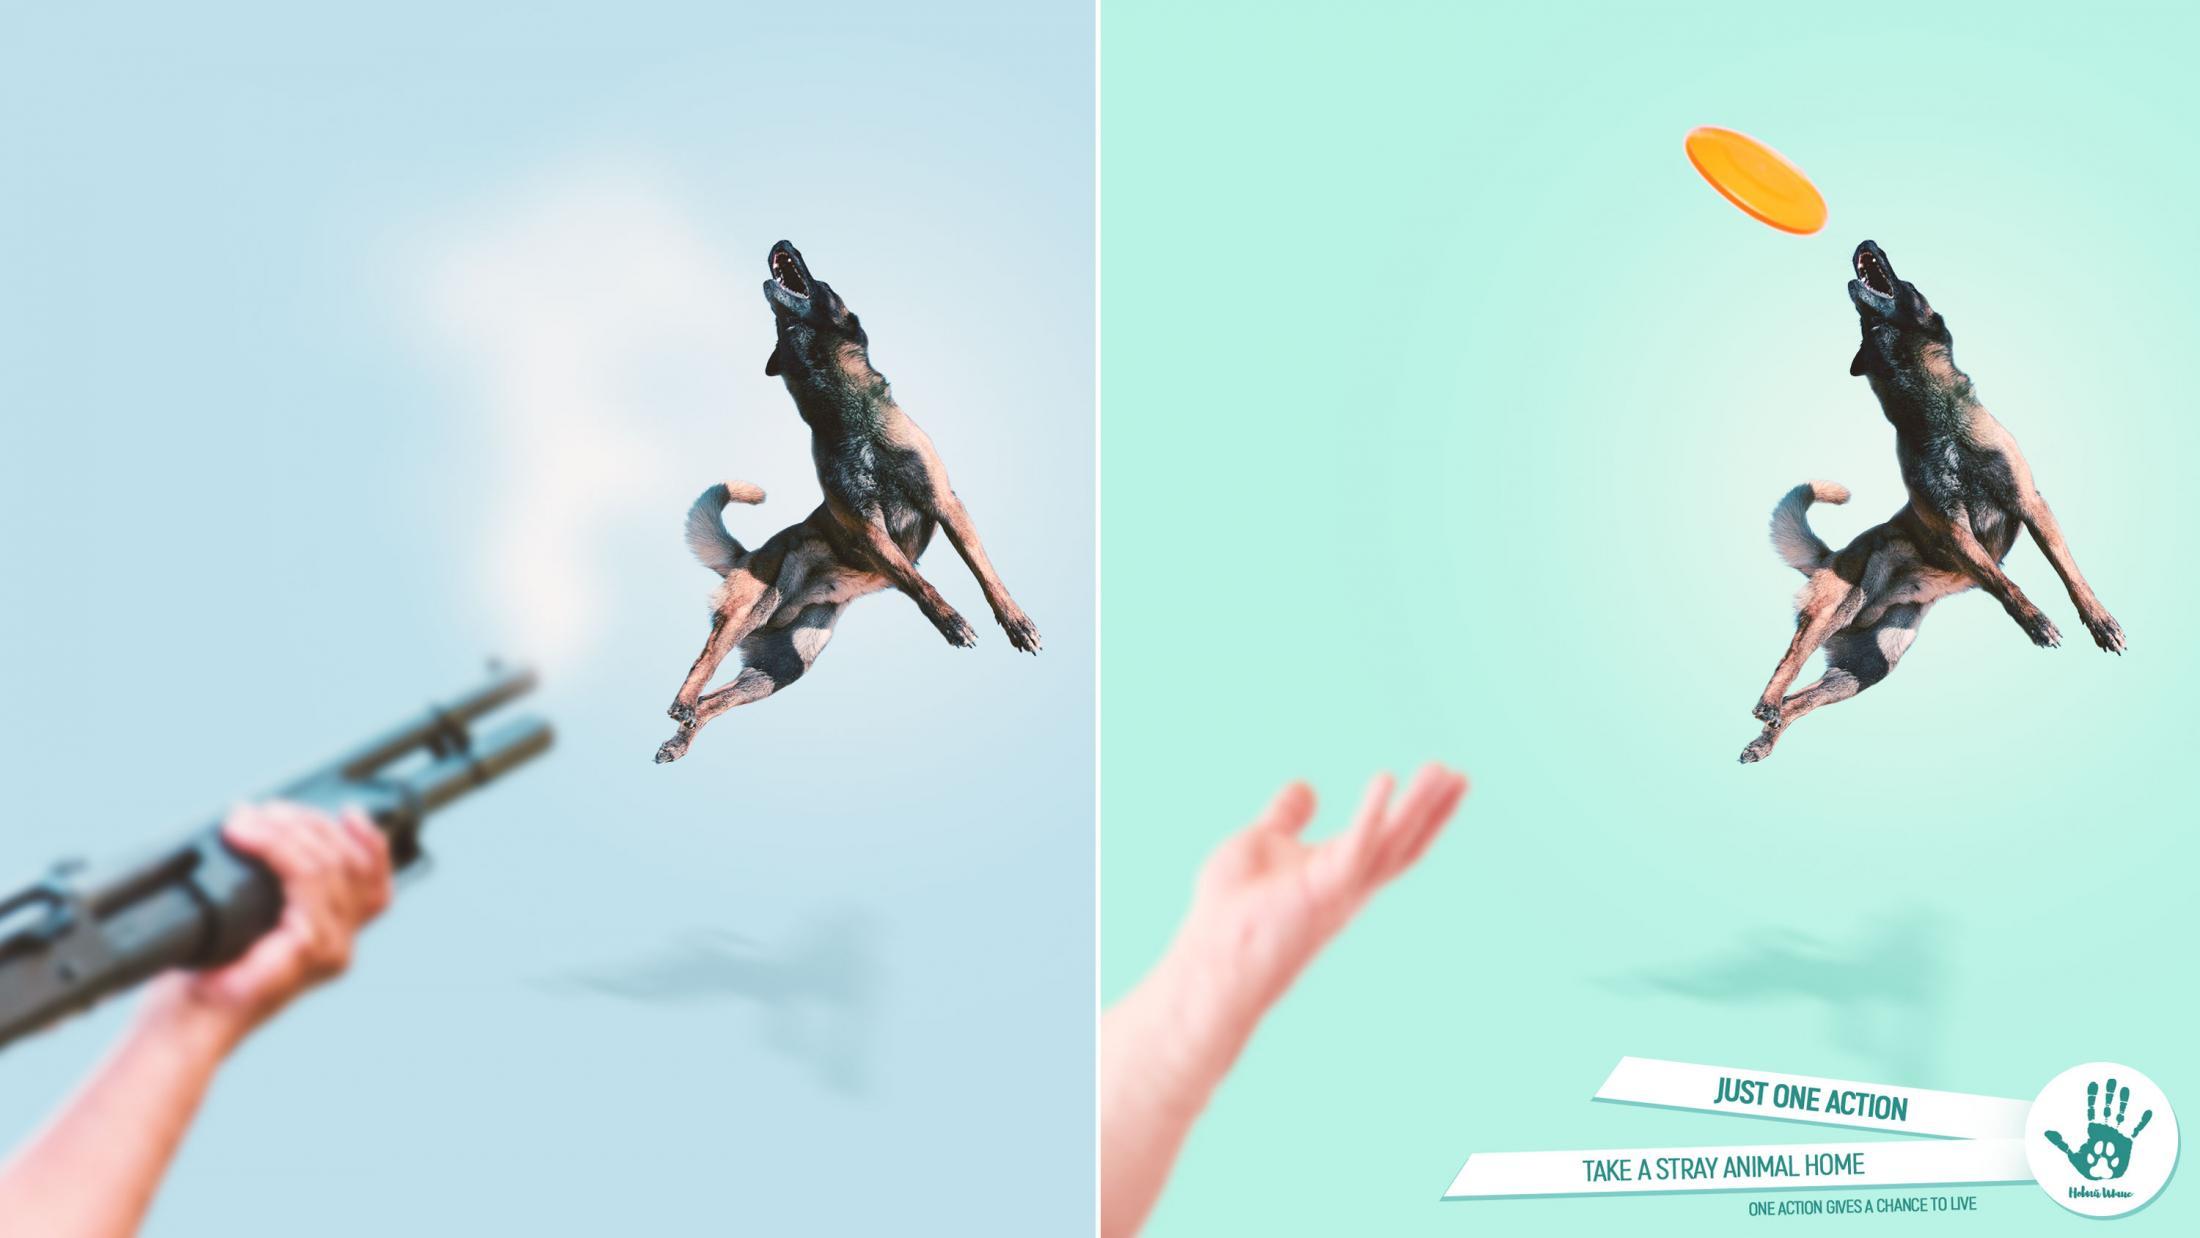 Novy Shans Print Ad - Shelter for homeless animals, 2